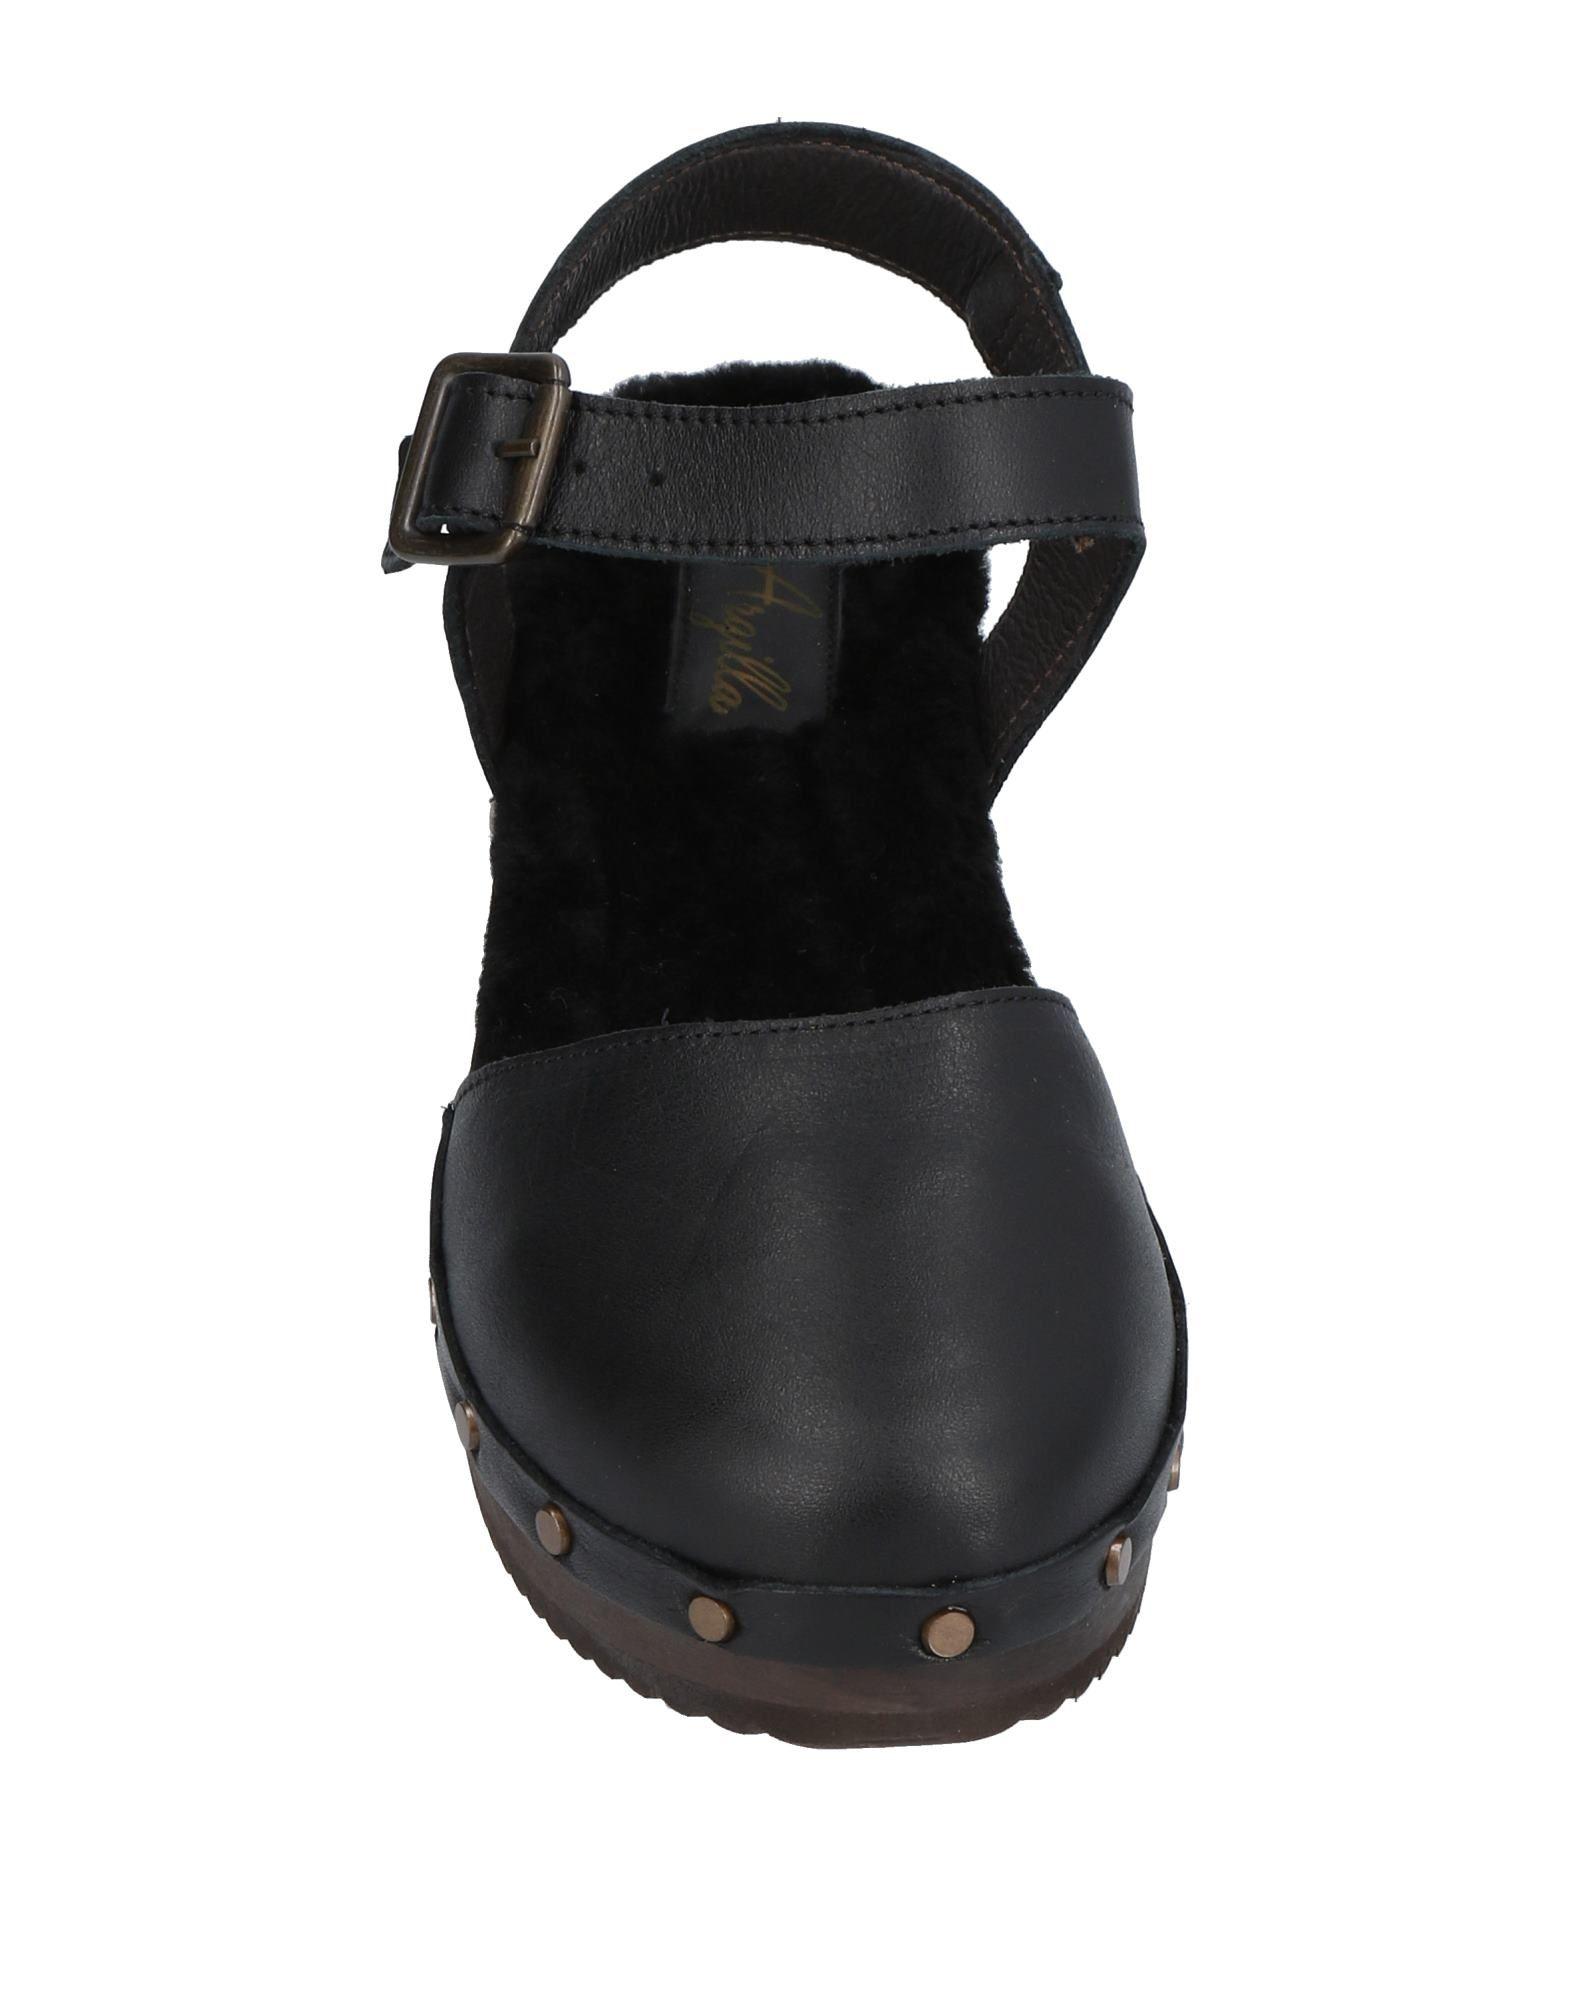 Argilla Damen Pantoletten Damen Argilla  11455900RS Gute Qualität beliebte Schuhe e63685